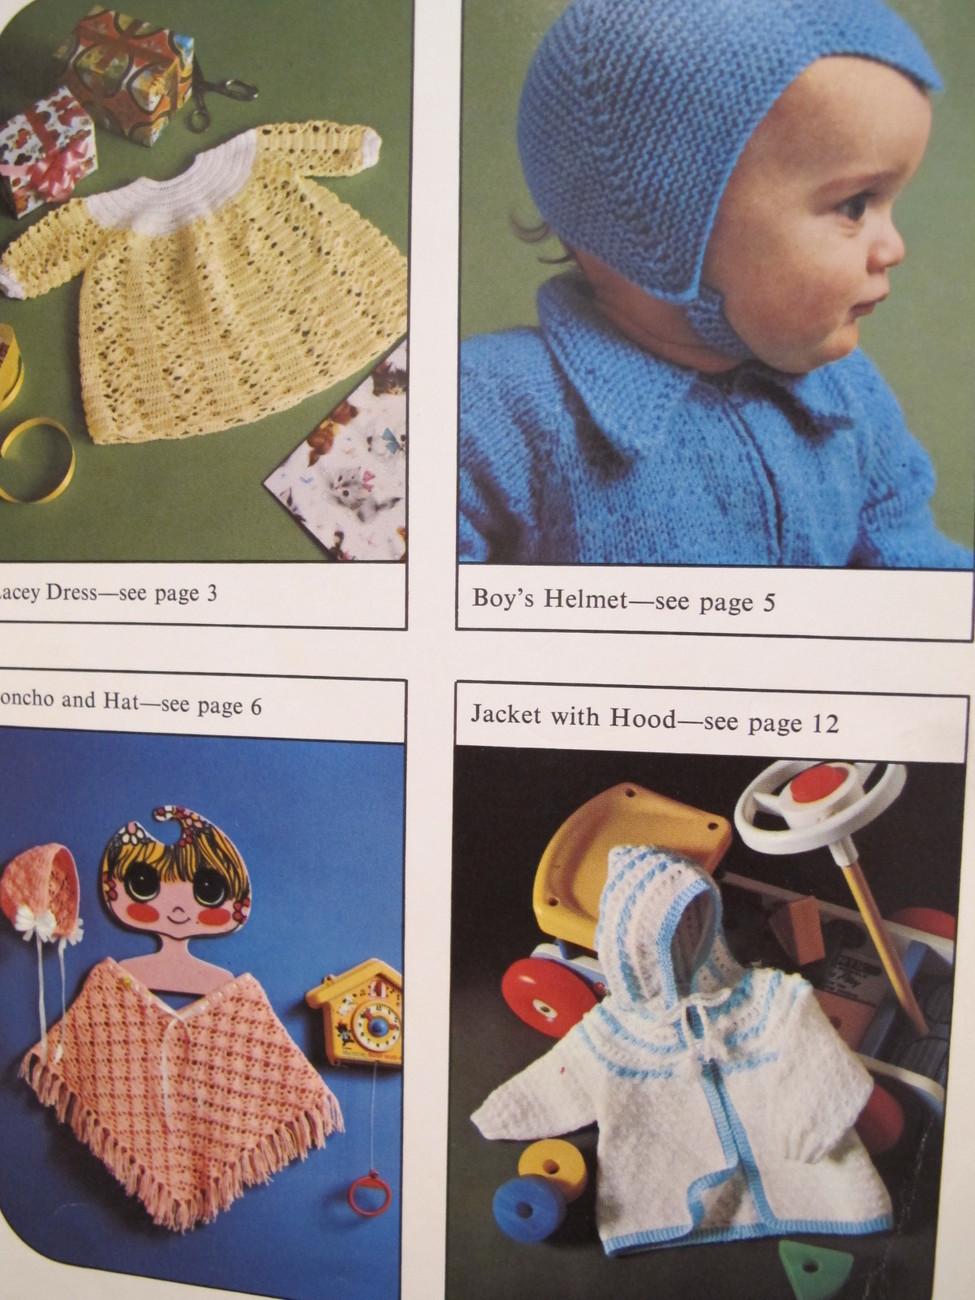 Vintage Patons Knitting Crochet Patterns BABY Suit Dress Cardigan Jacket BABIES